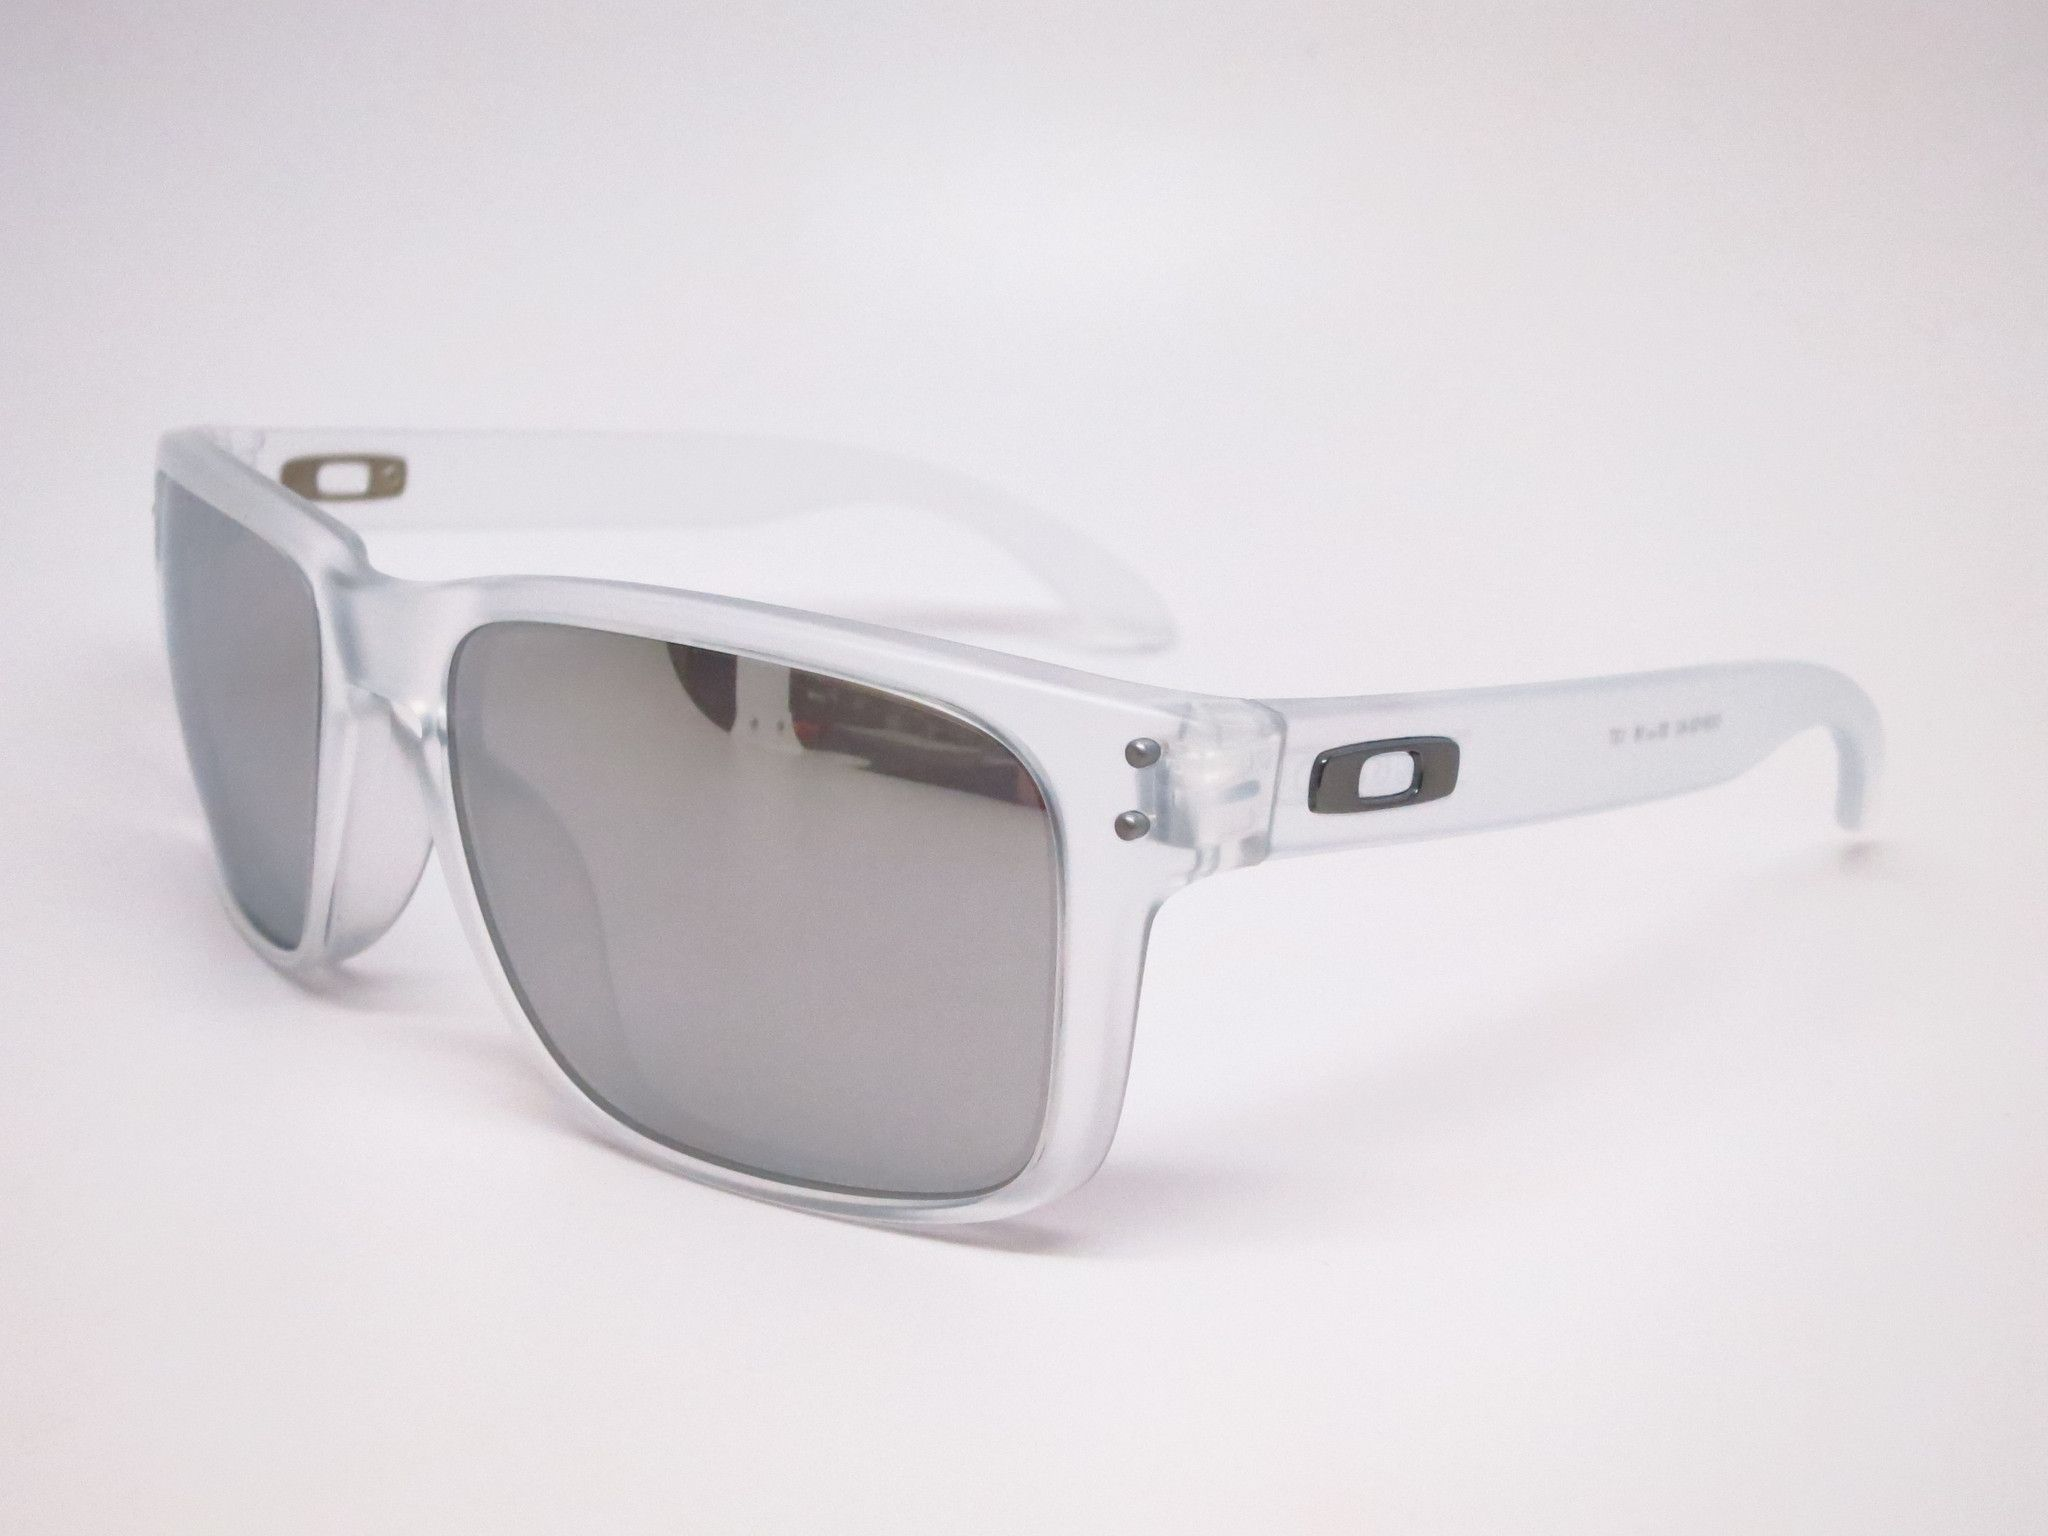 Oakley Holbrook OO9102-A2 Matte Clear Sunglasses   Gafas y Accesorios